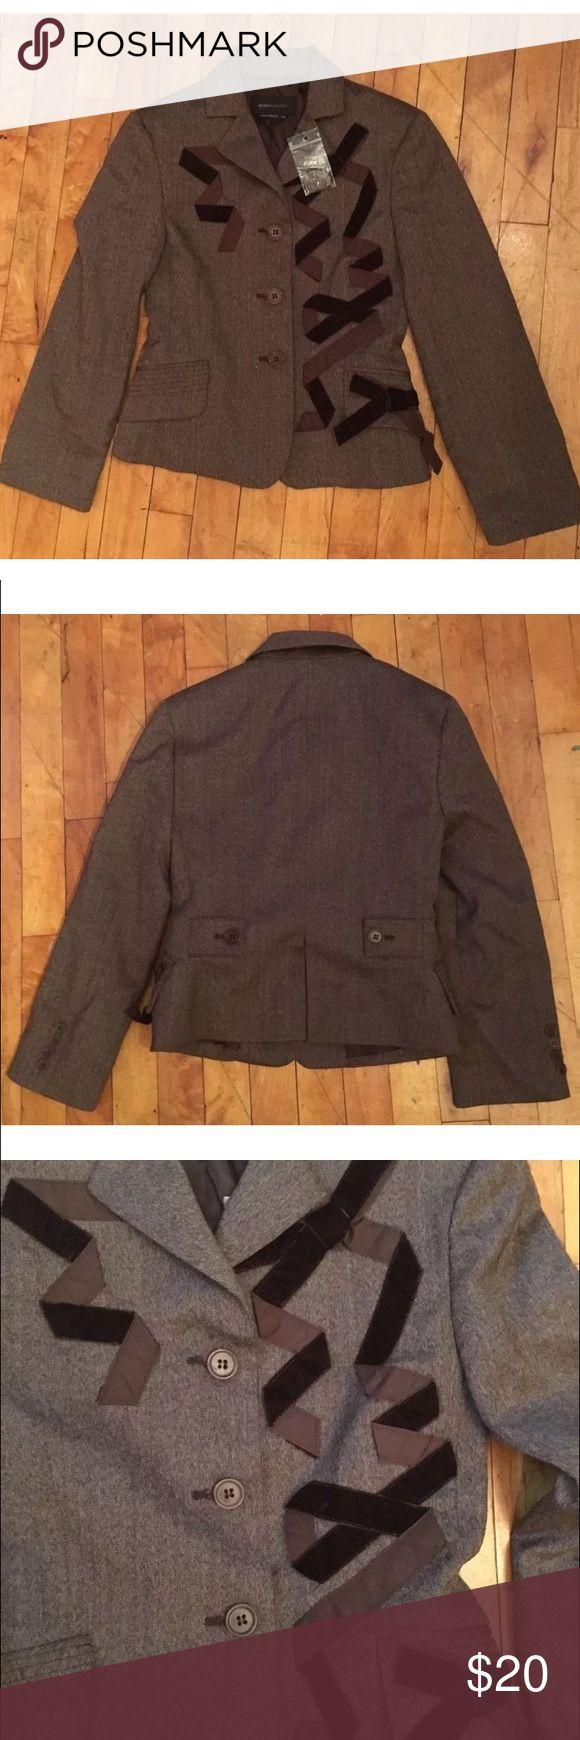 BCBG Maxazria Women's Velvet Blazer BCBGMaxAzria women's brown wool blendlined blazer with velvet ribbon embellishments.The coat is a tailored fit. It is a sizeXXS. For measurements please ask. It is in excellent condition. BCBGMaxAzria Jackets & Coats Blazers